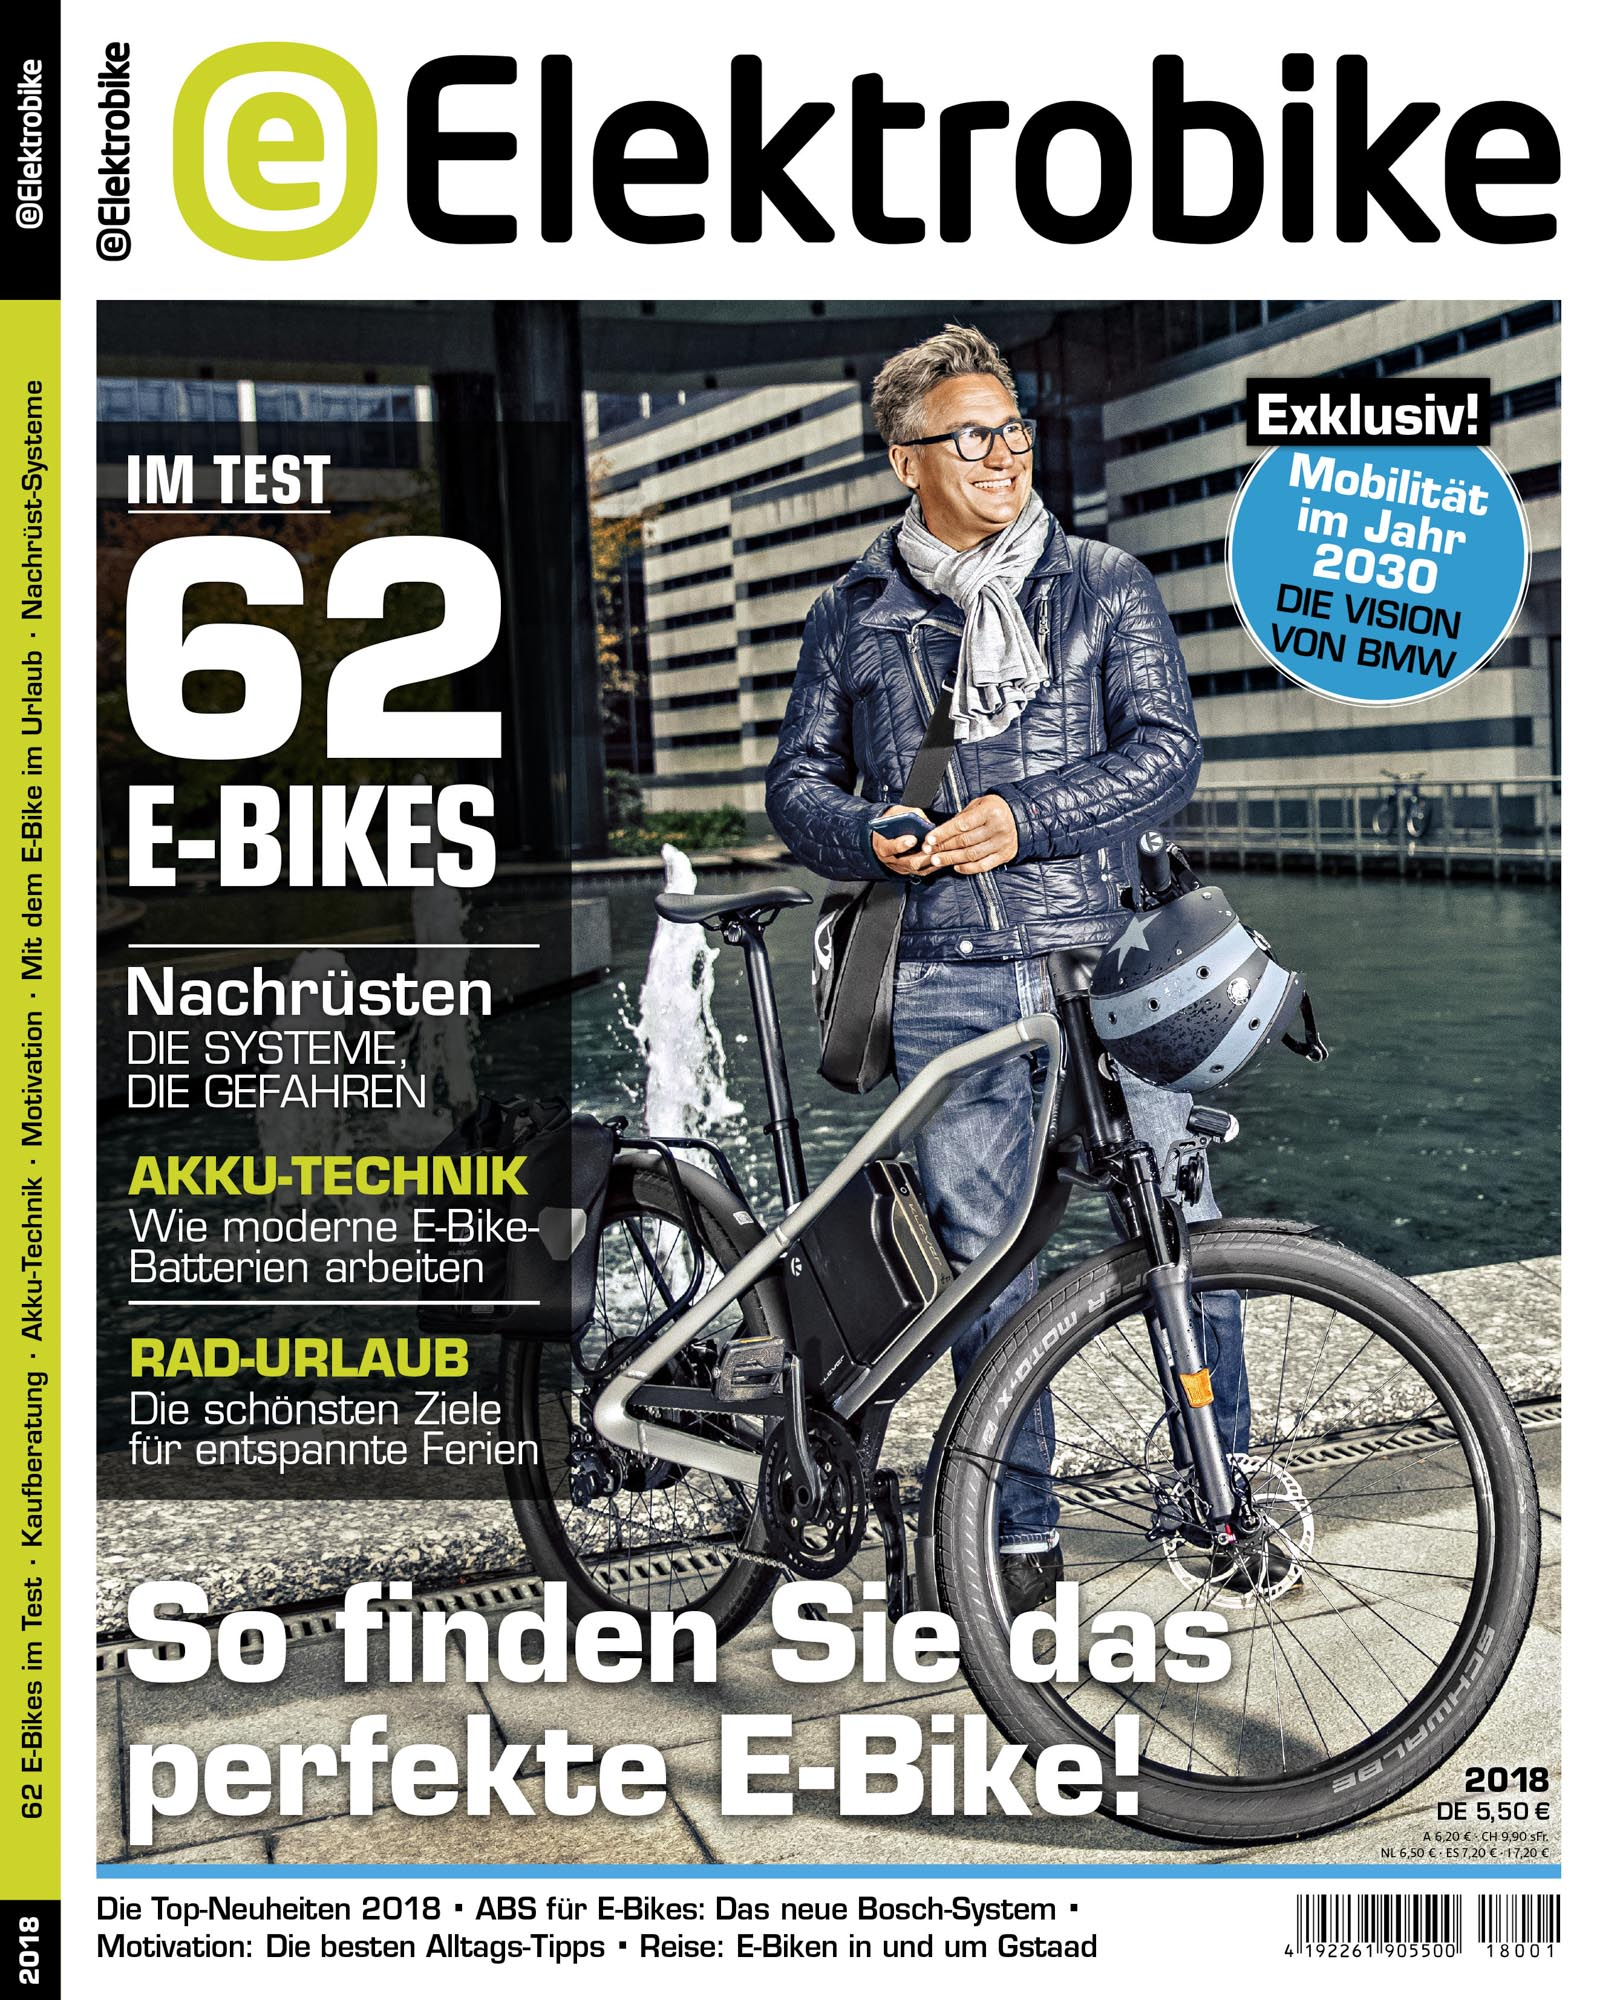 ELEKTROBIKE-Titelbild, Ausgabe 1/2018